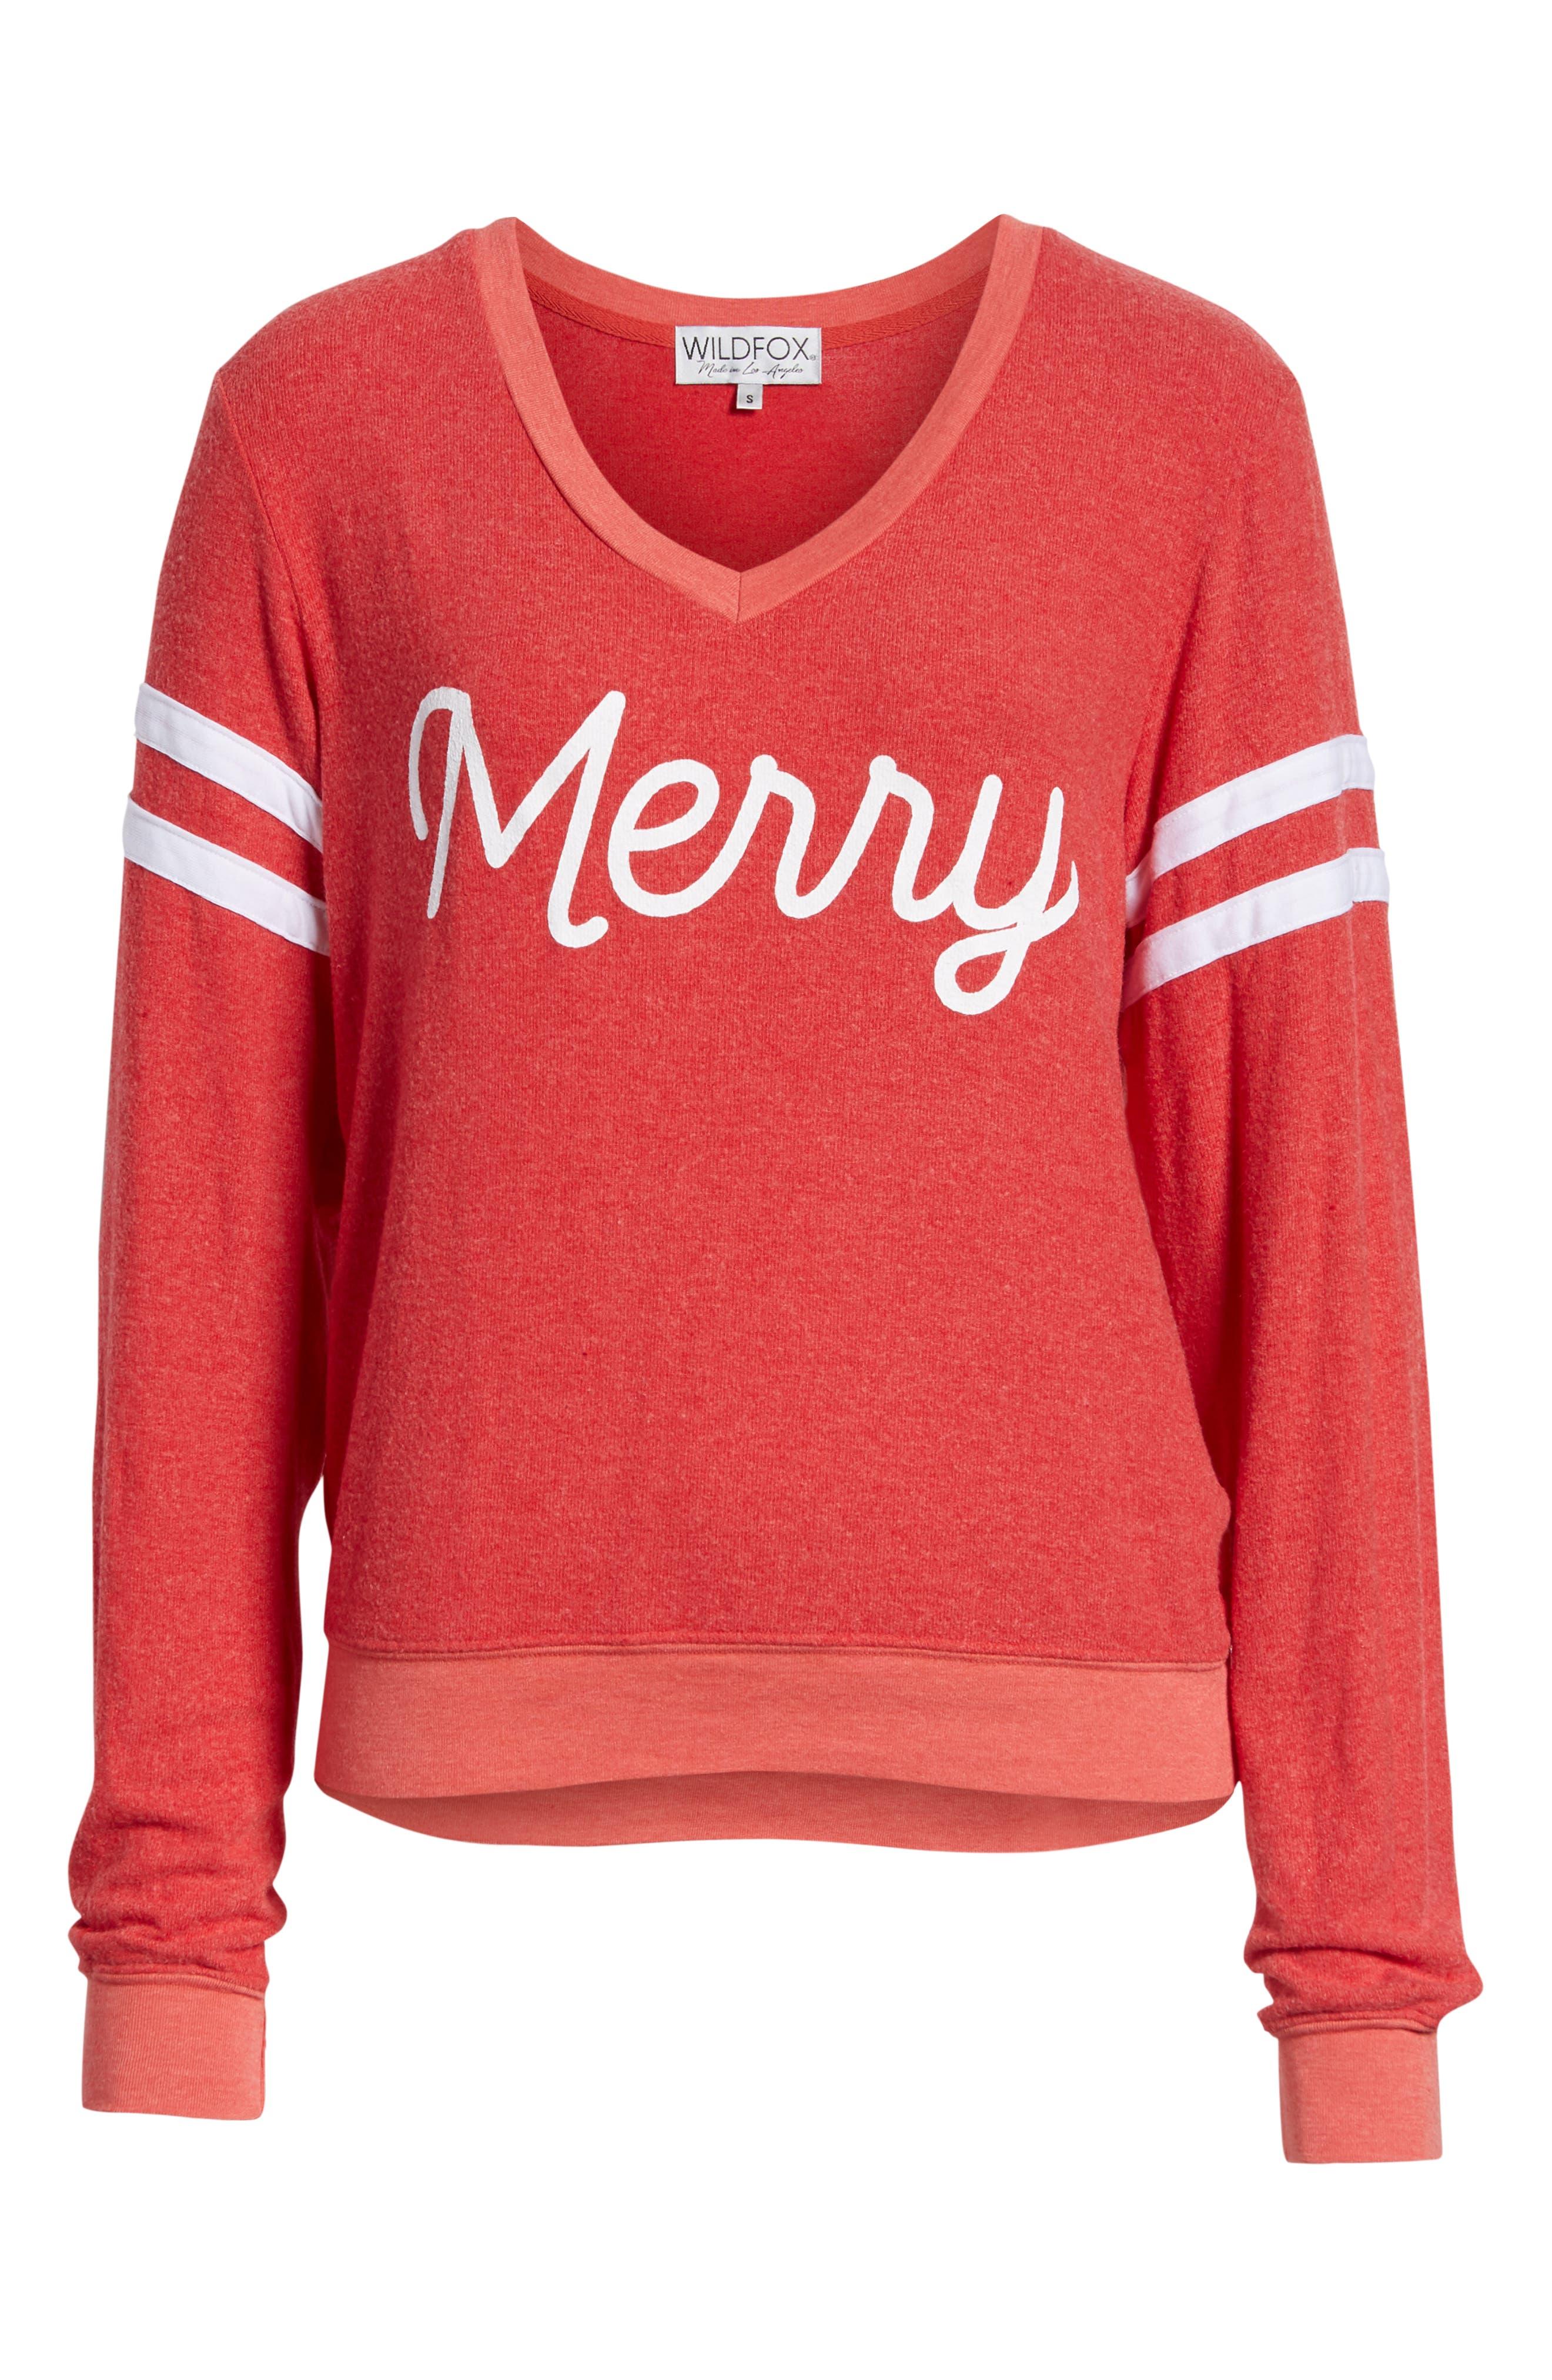 Merry Sport Baggy Beach V-Neck Pullover,                             Alternate thumbnail 6, color,                             SCARLET